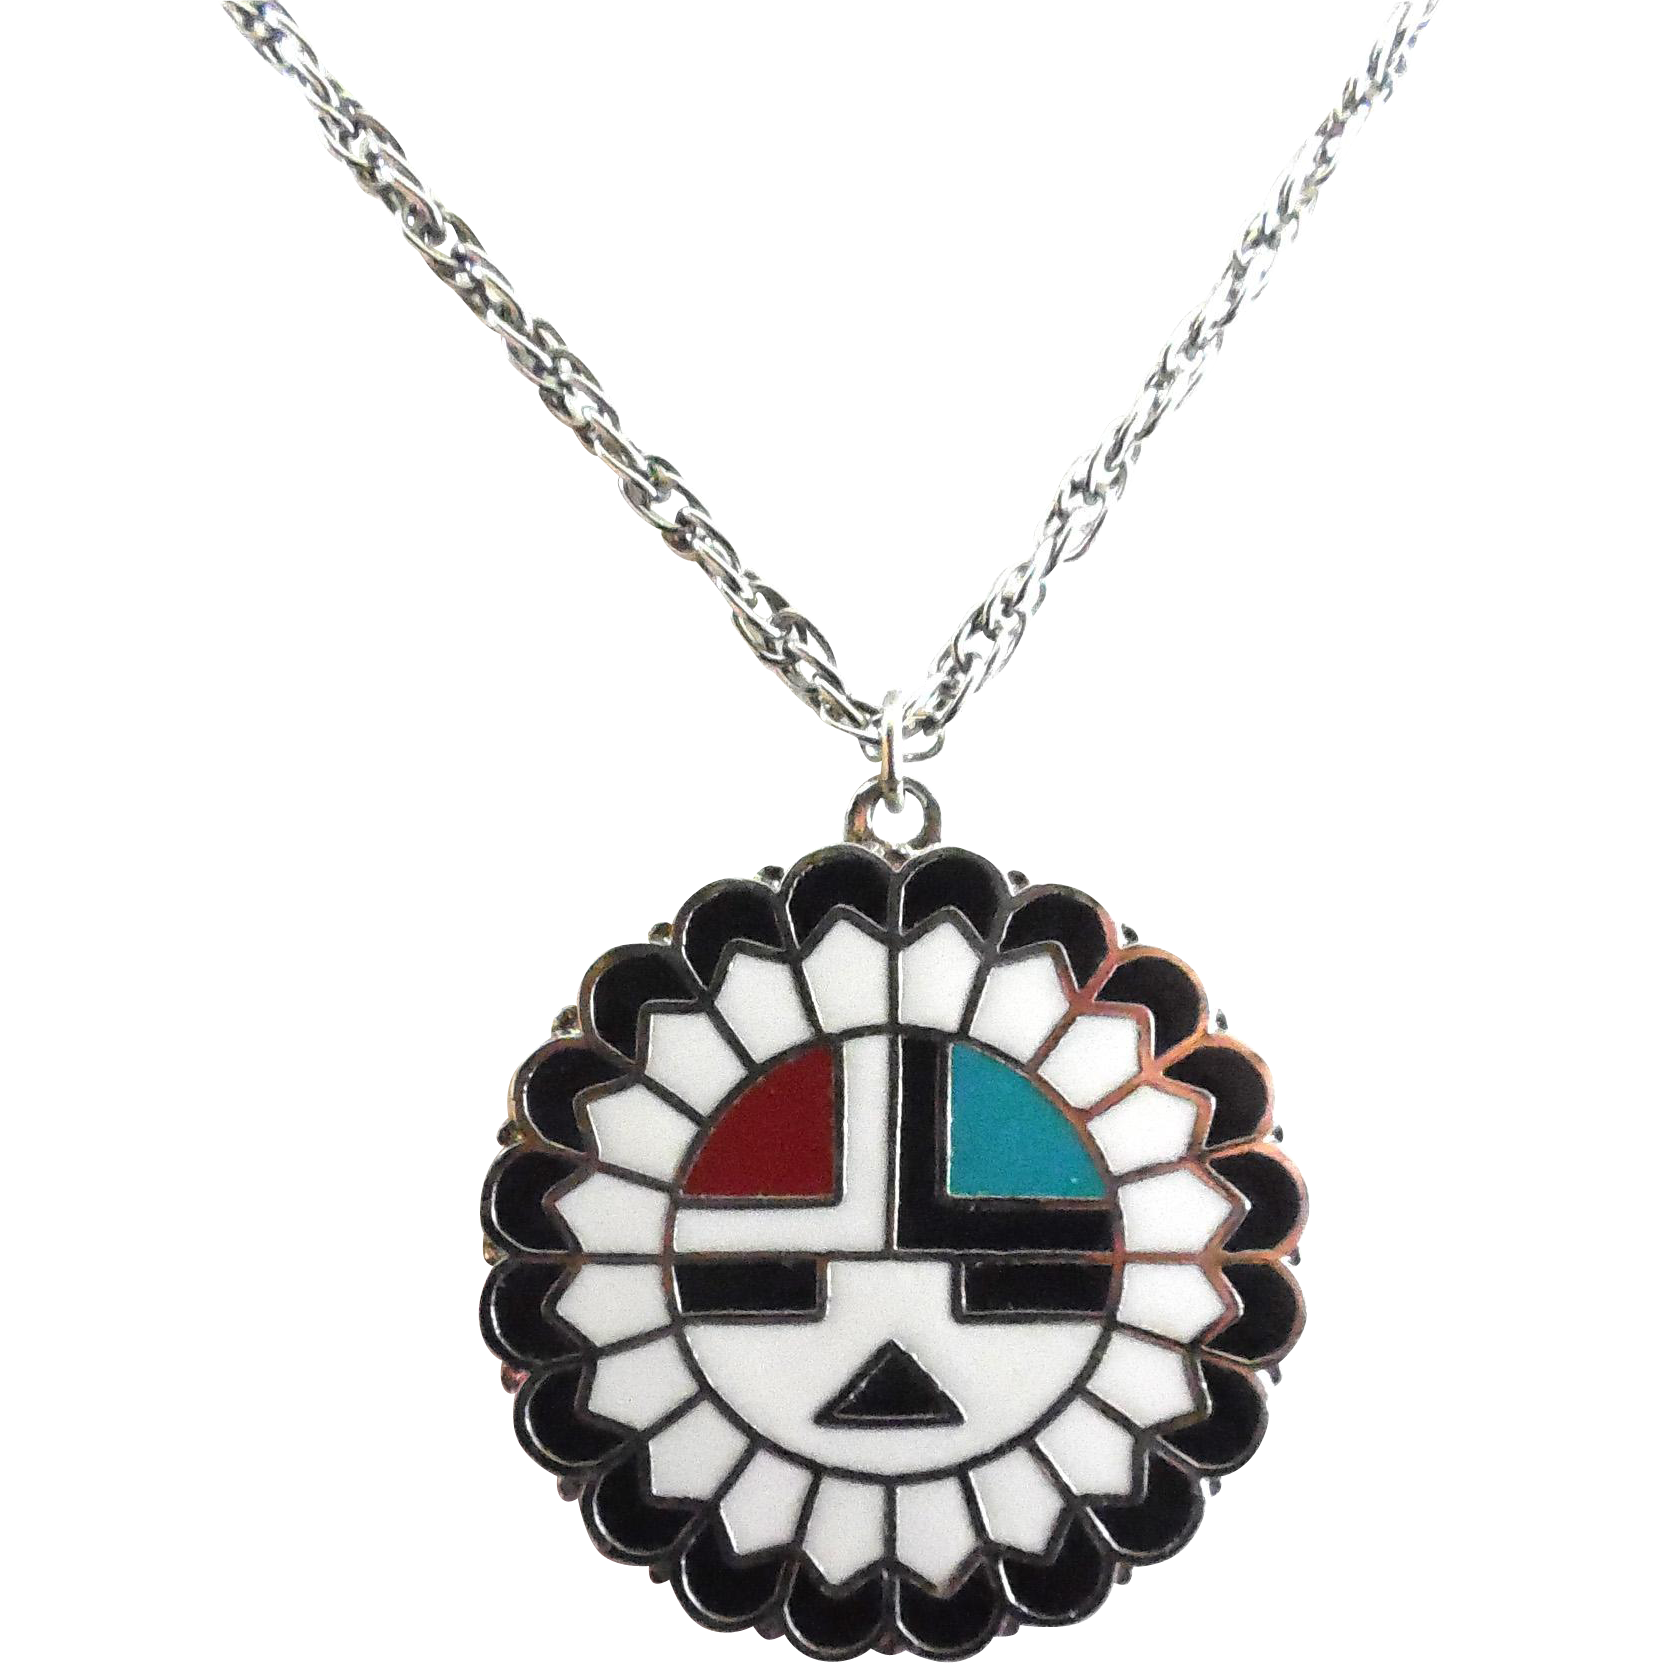 Vintage enamel native american hopi sun symbol pendant necklace rubylane rubylane rubylanecom vintage enamel native american hopi sun symbol buycottarizona Images